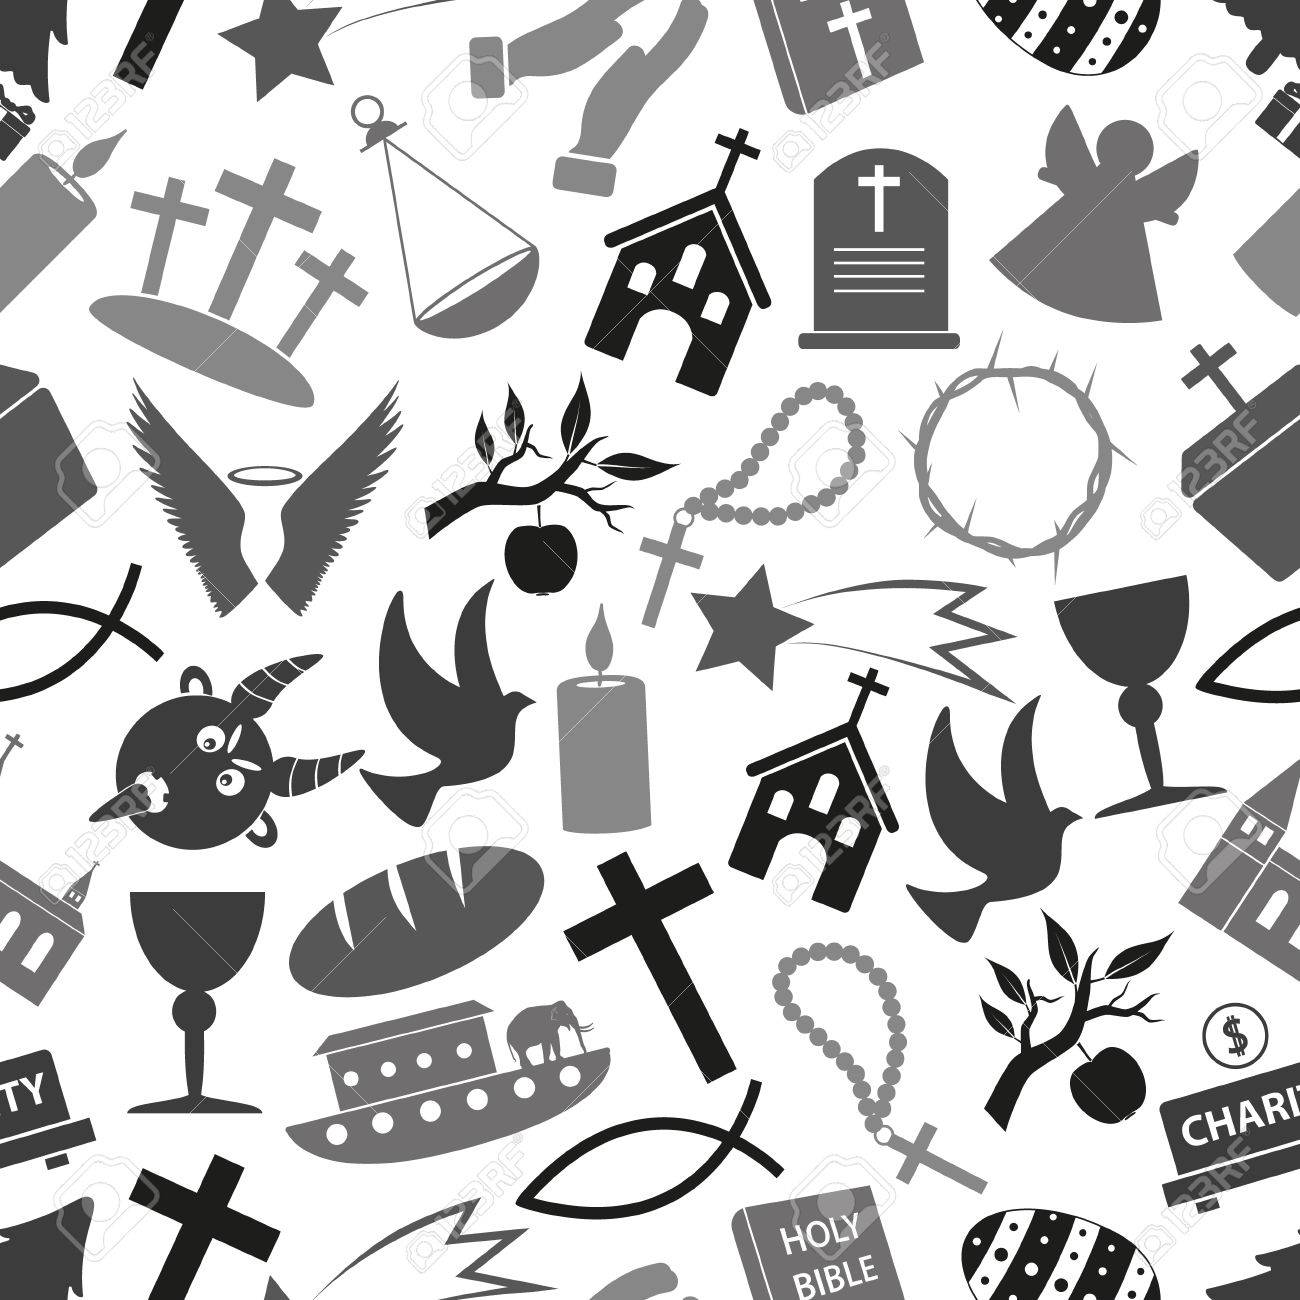 Christianity Religion Symbols Grayscale Seamless Pattern Eps10